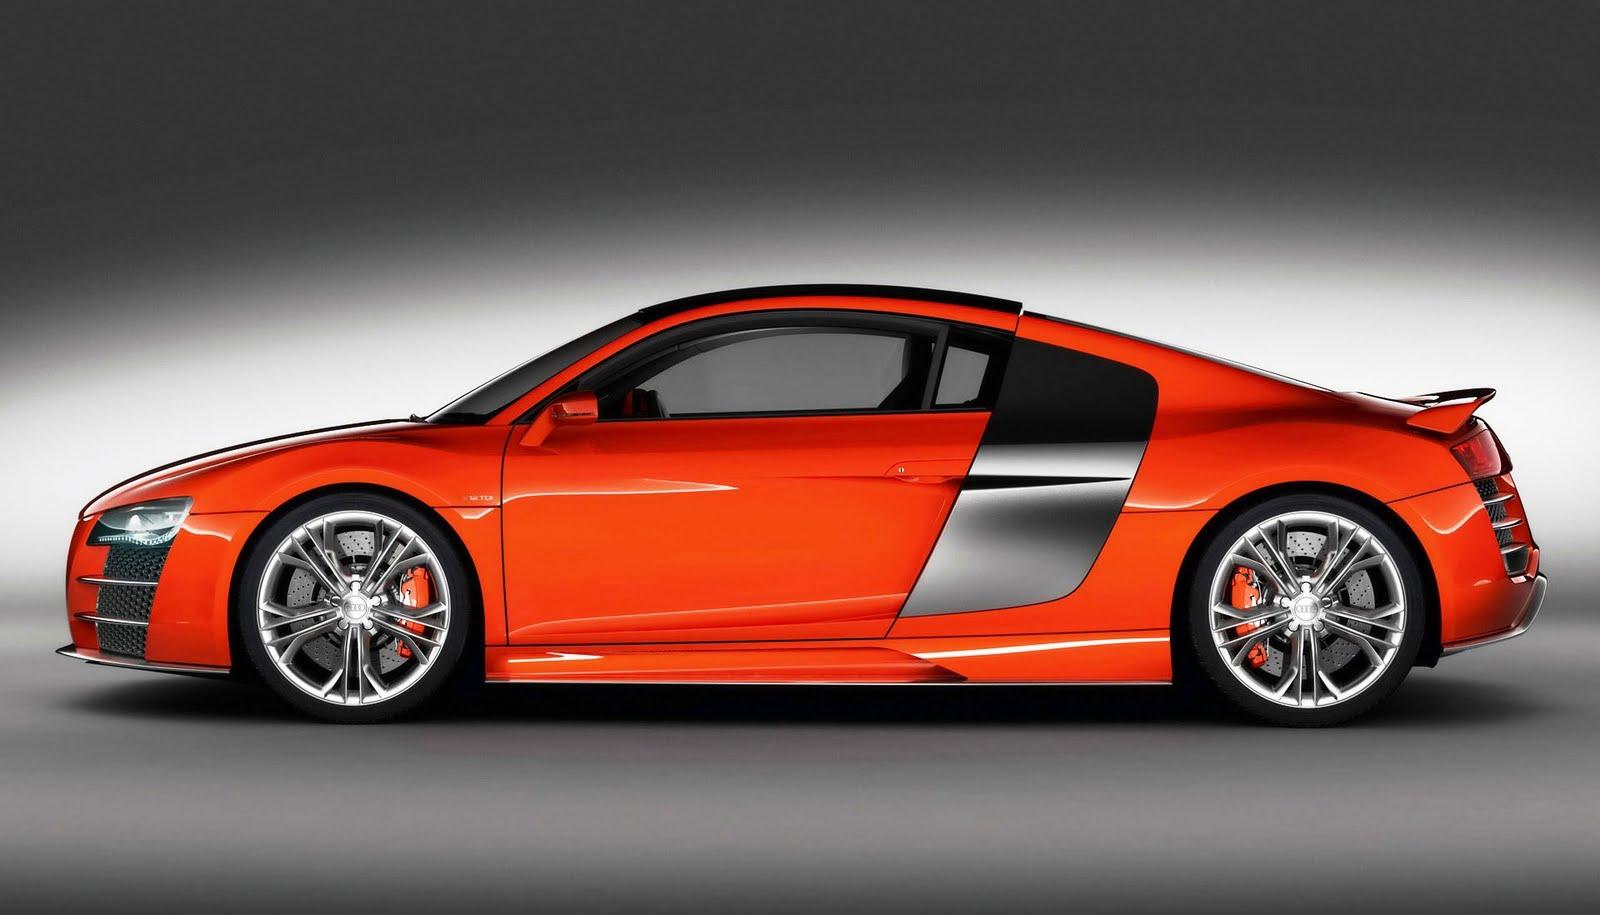 Audi Tt Coupe – Audi TT Coupe Red Cutaway